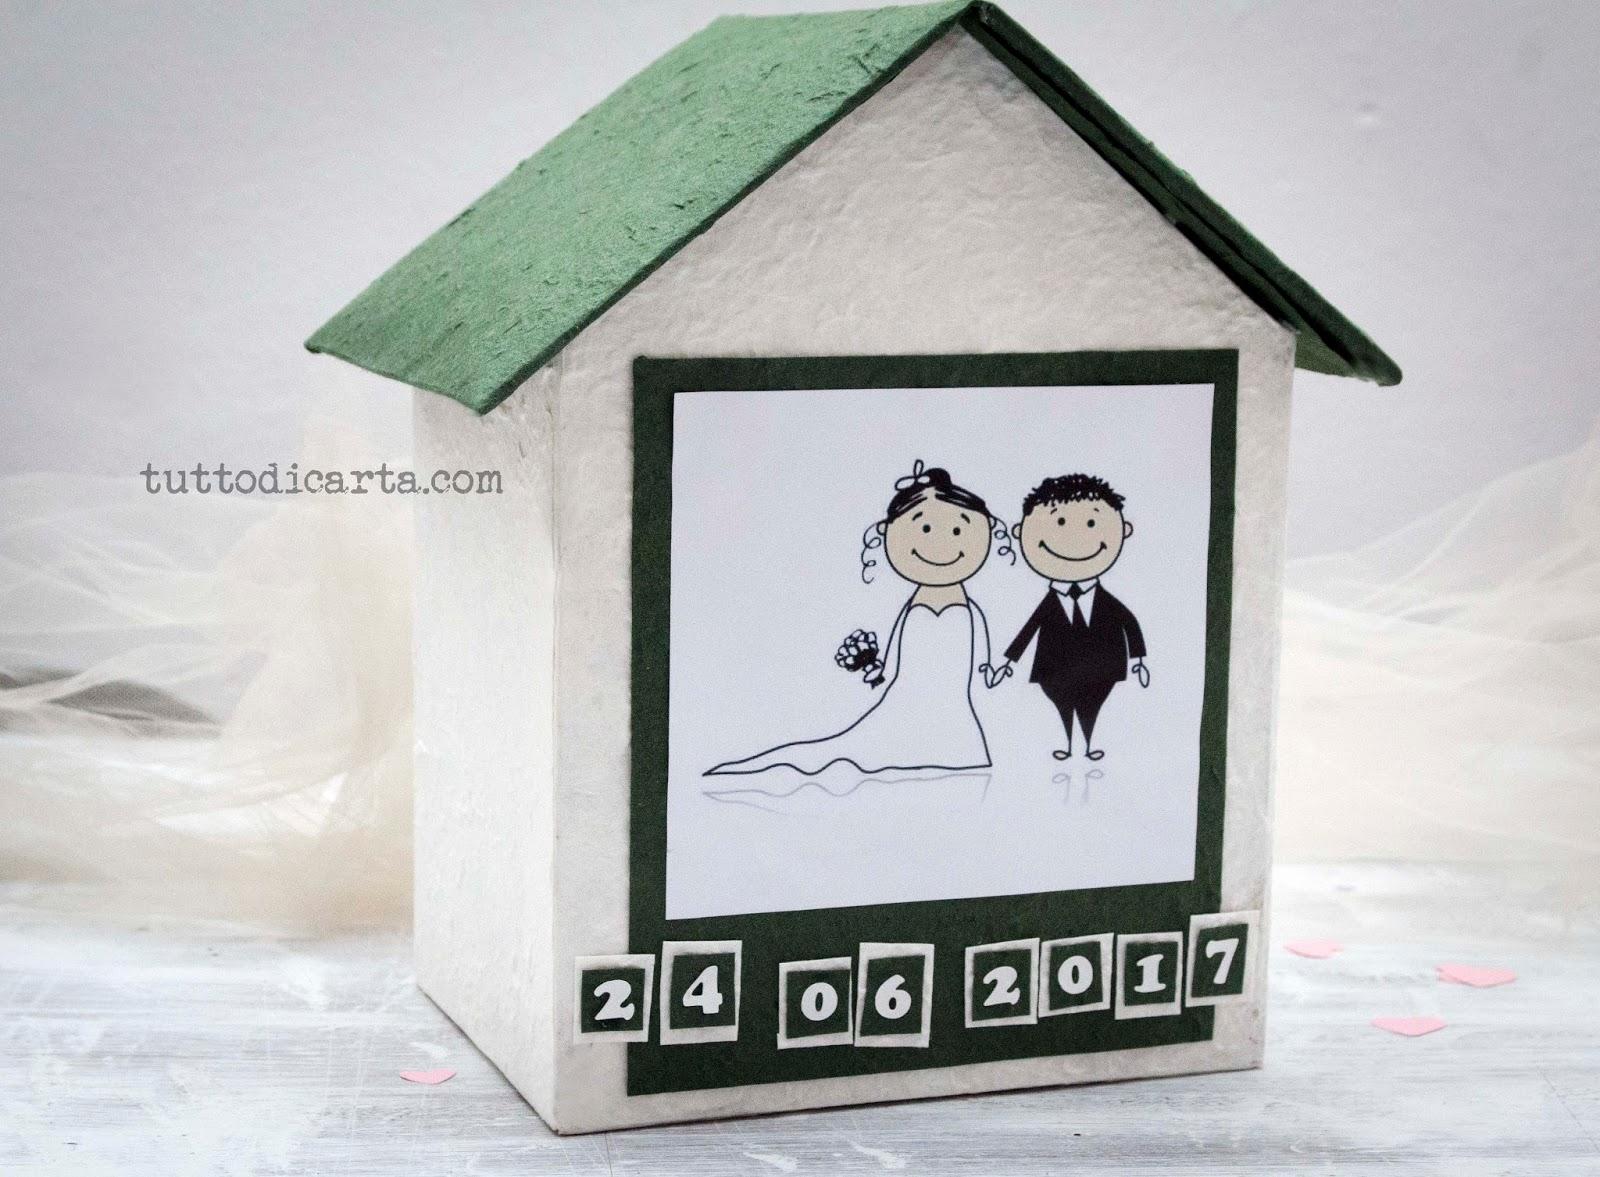 Buste Matrimonio Toscana : Vendita album fotografici casetta porta buste per matrimonio